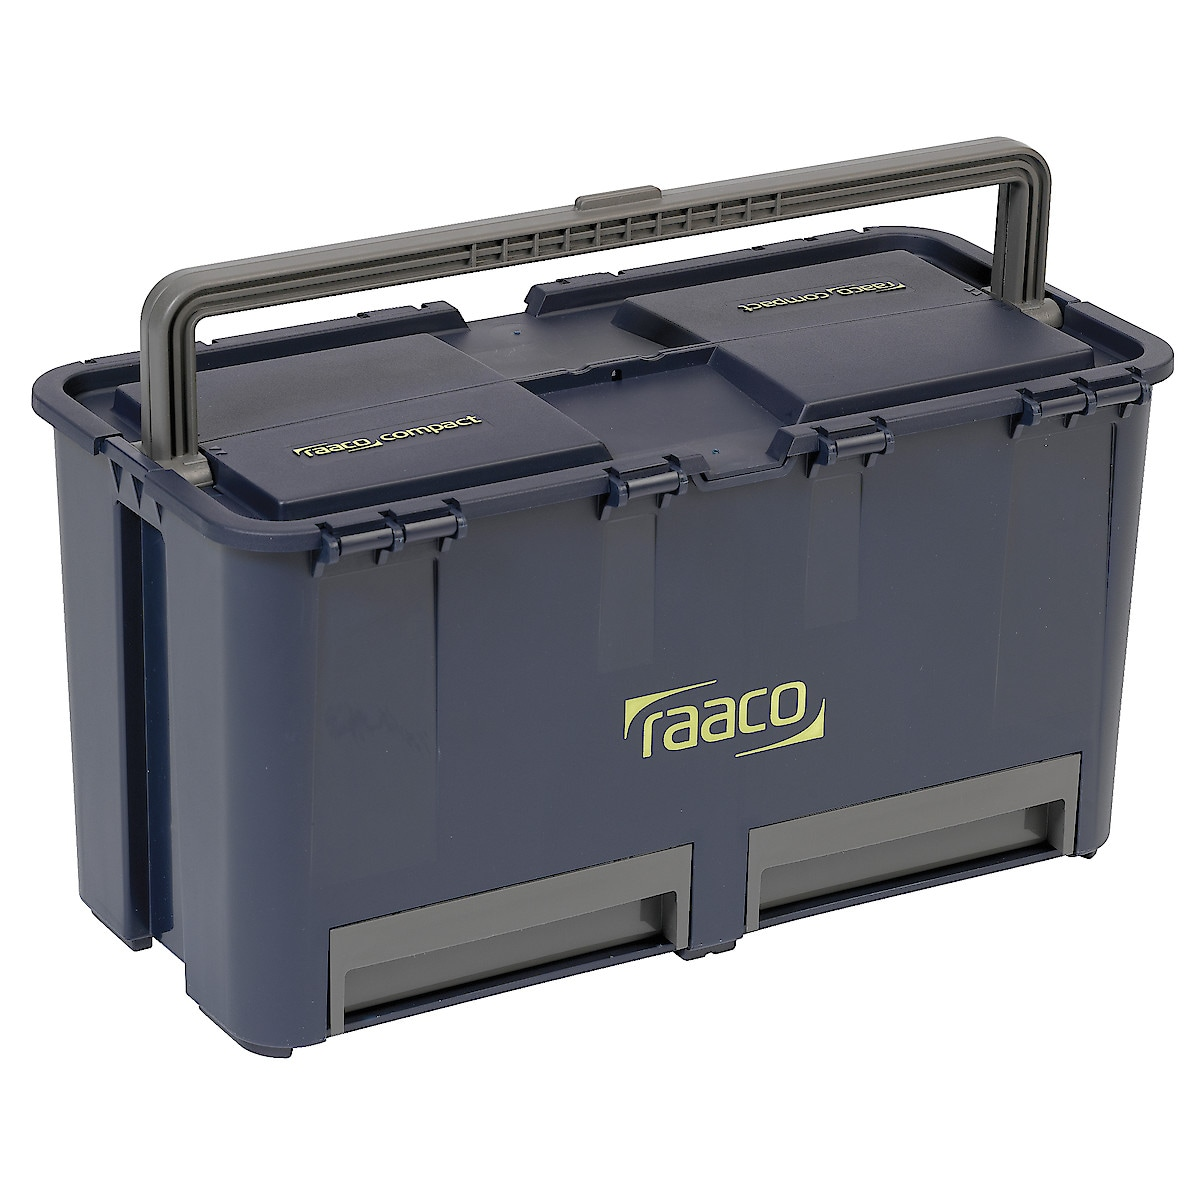 Verktygslåda Compact 27 Raaco